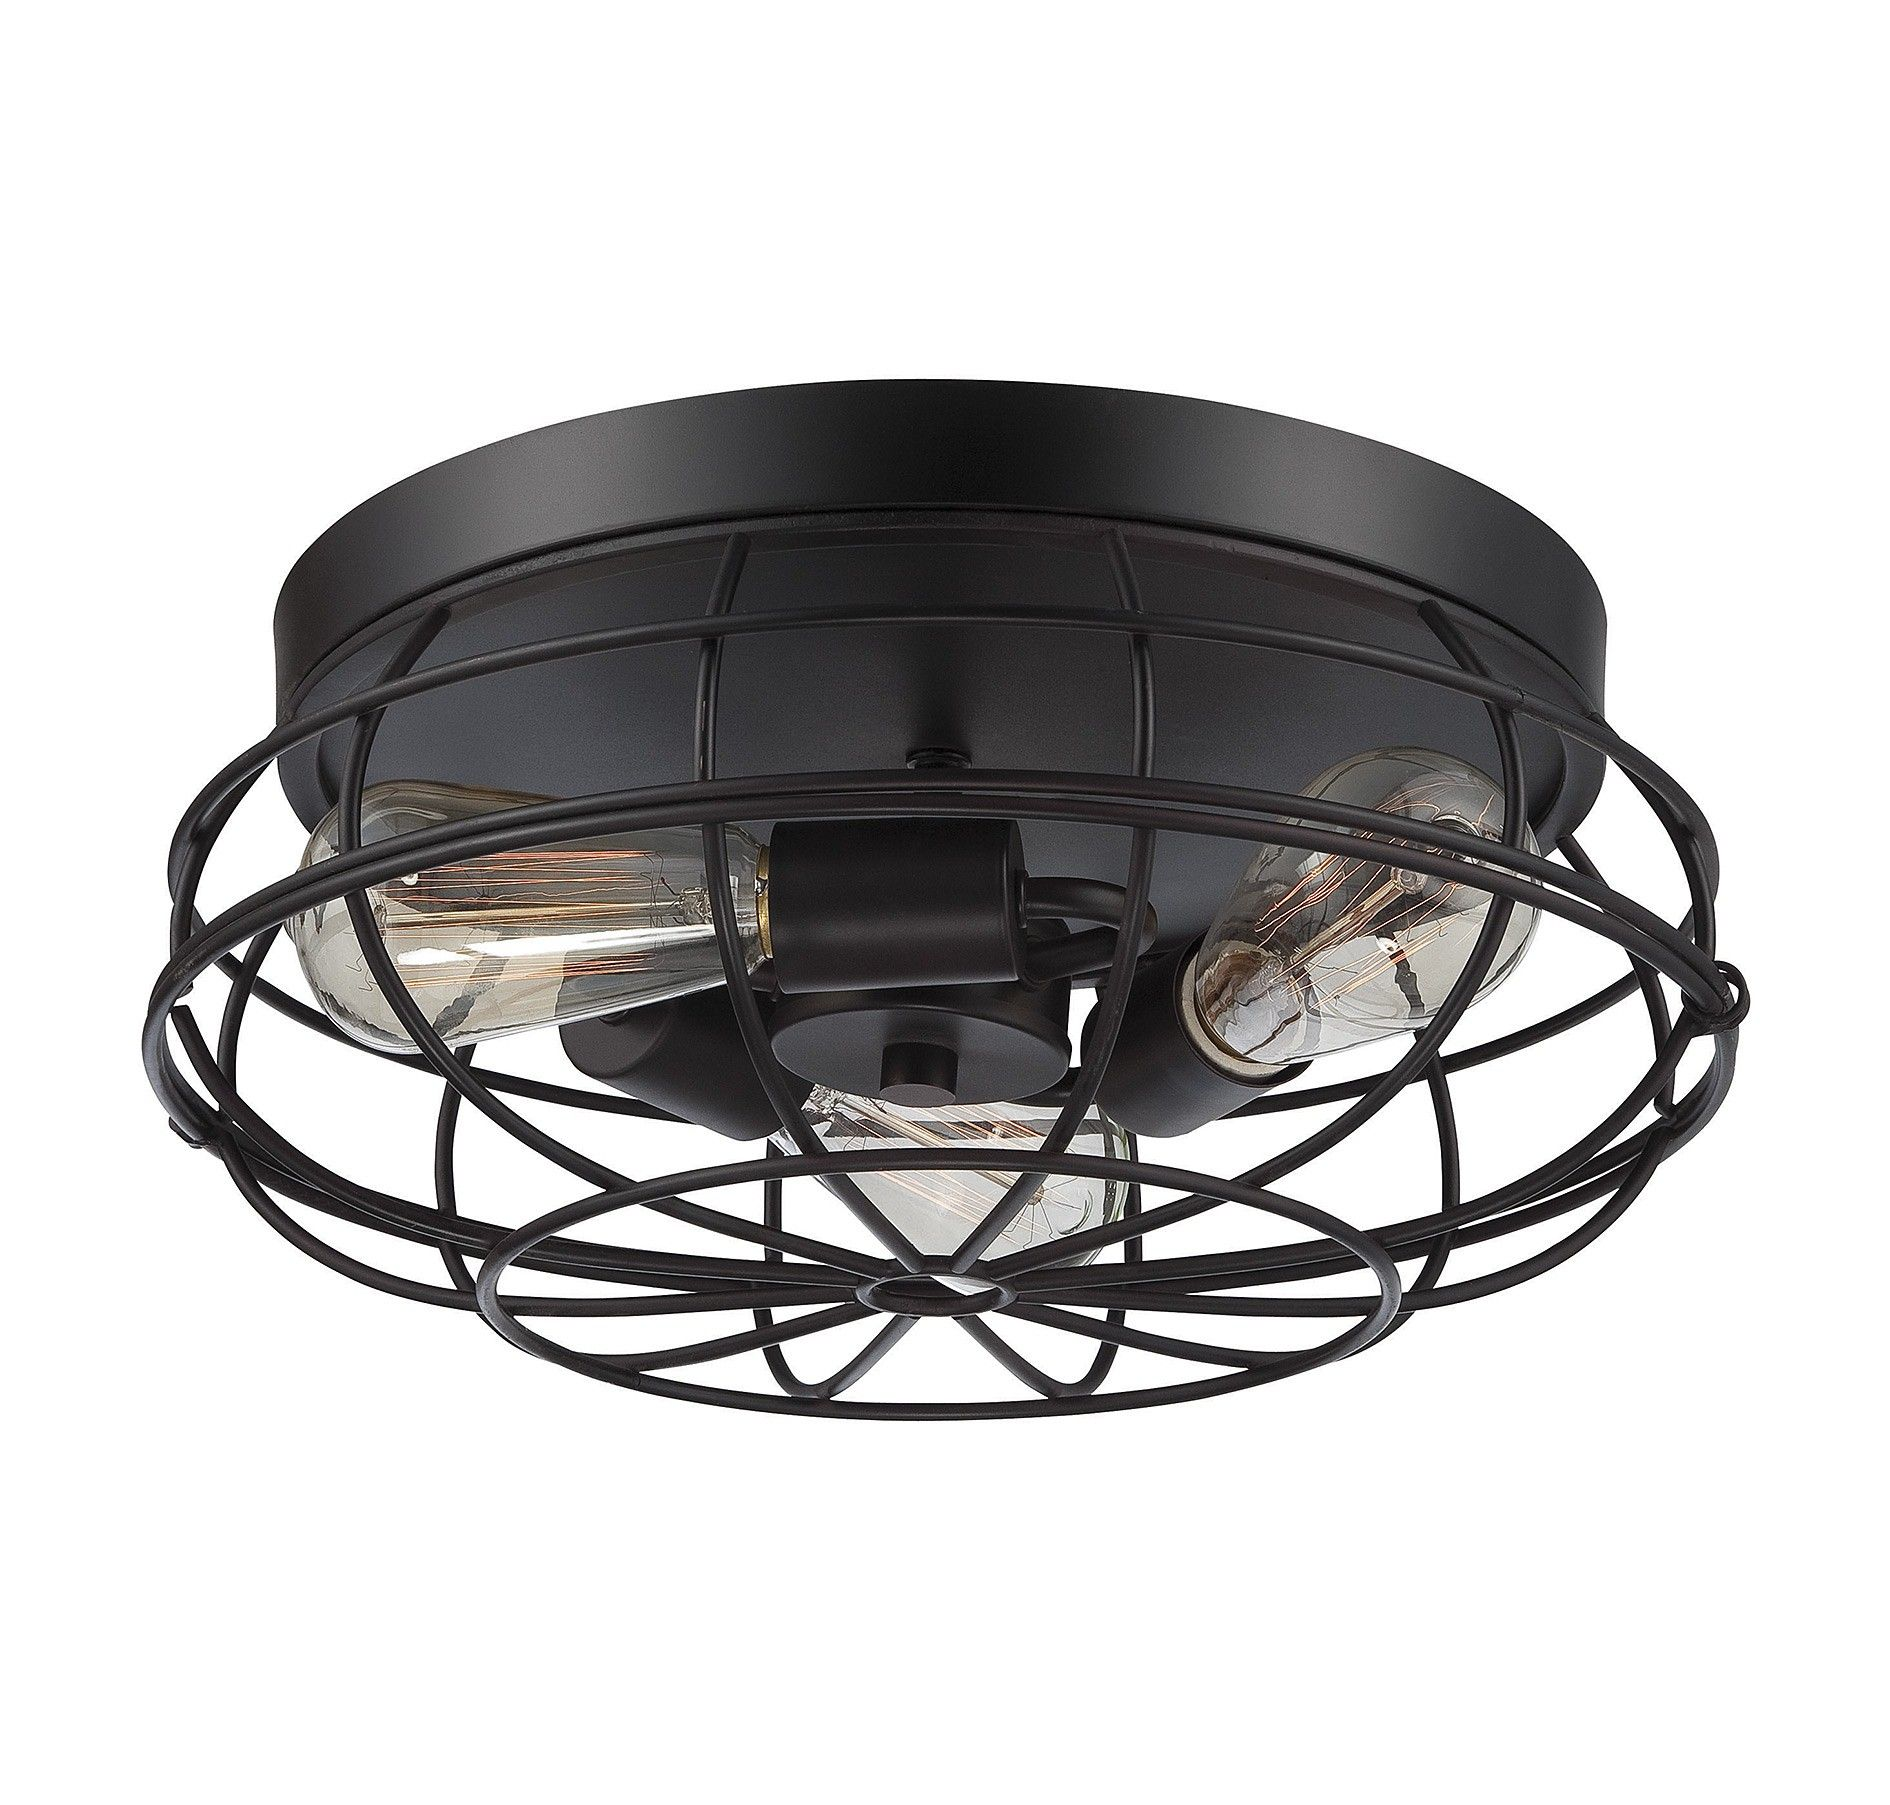 lights crystal flush drum bathroom ceilings light size led modern bulb and full mount of semi fixtures lighting ceiling